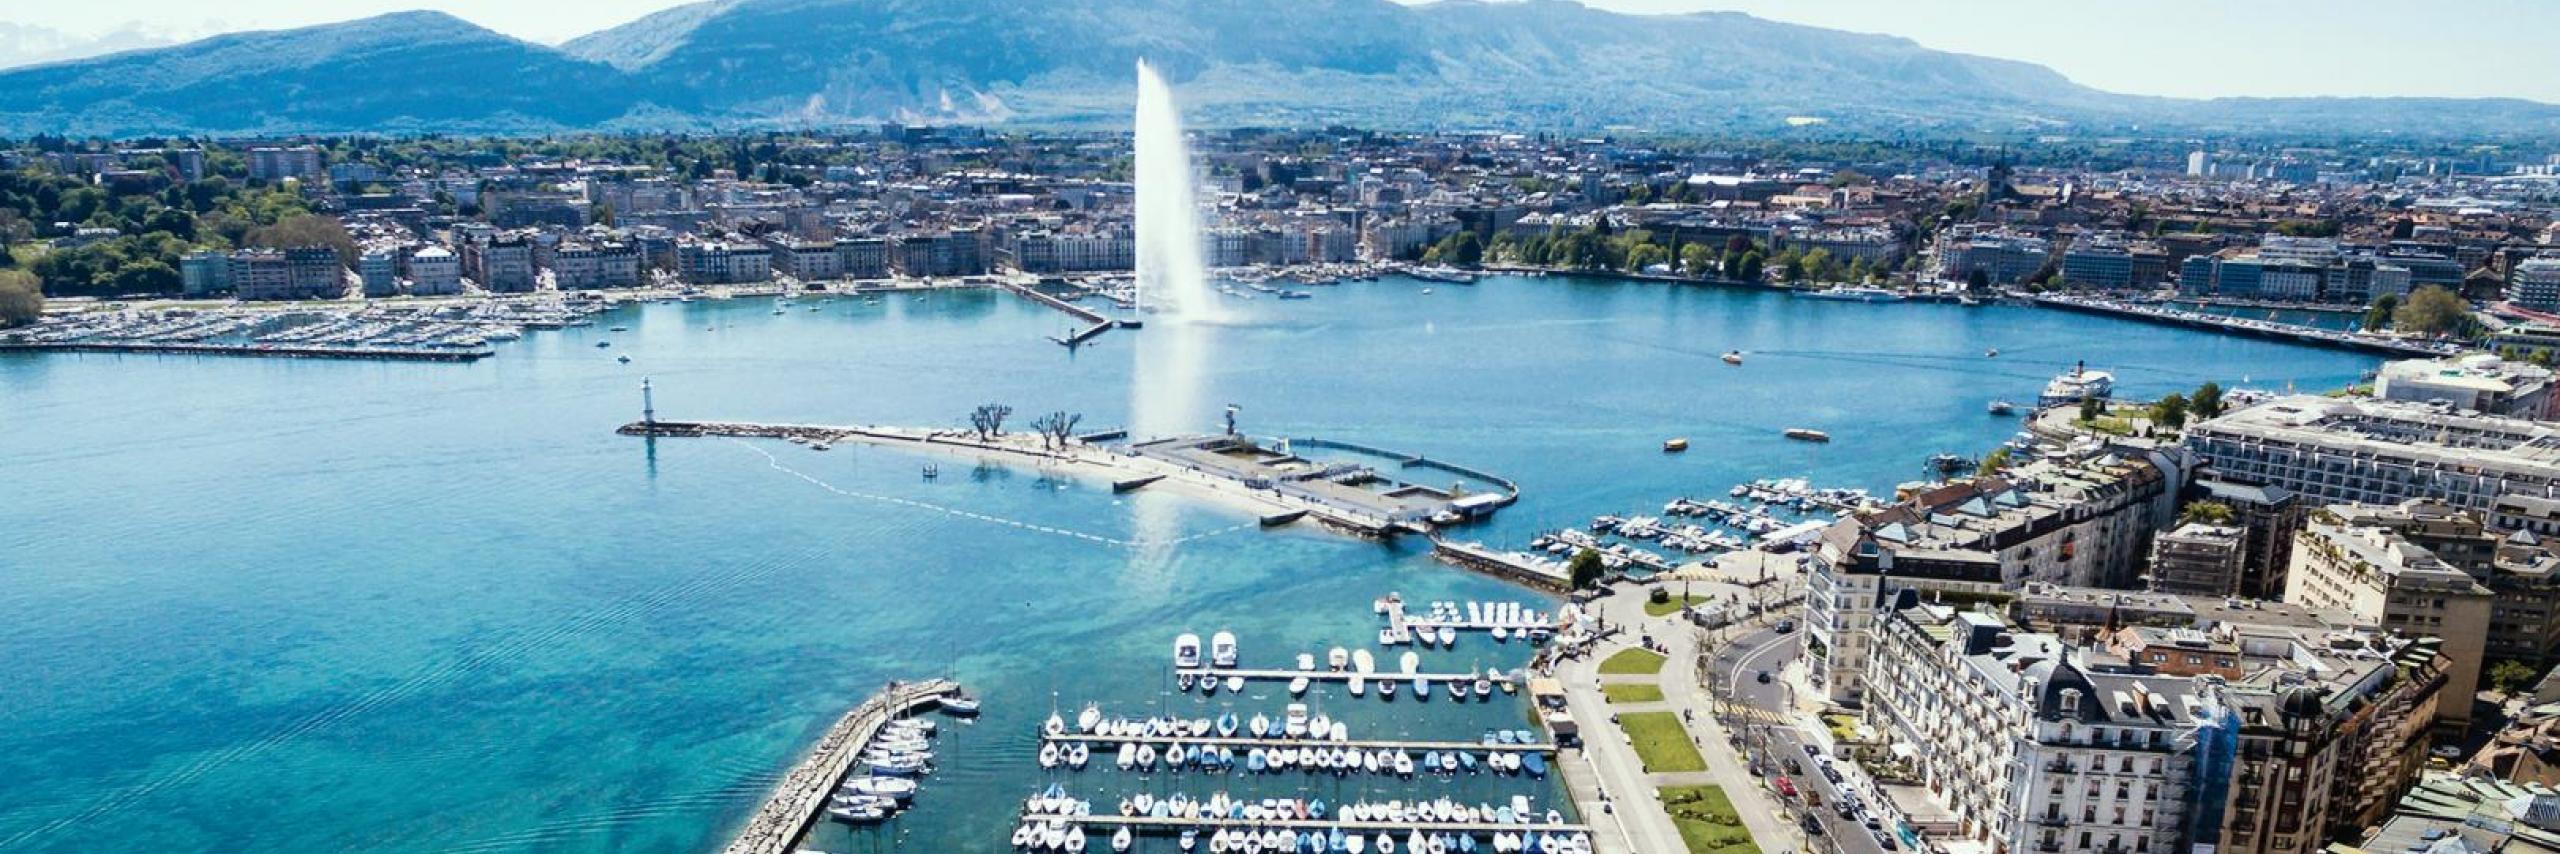 Internorte | Intercentro Genebra